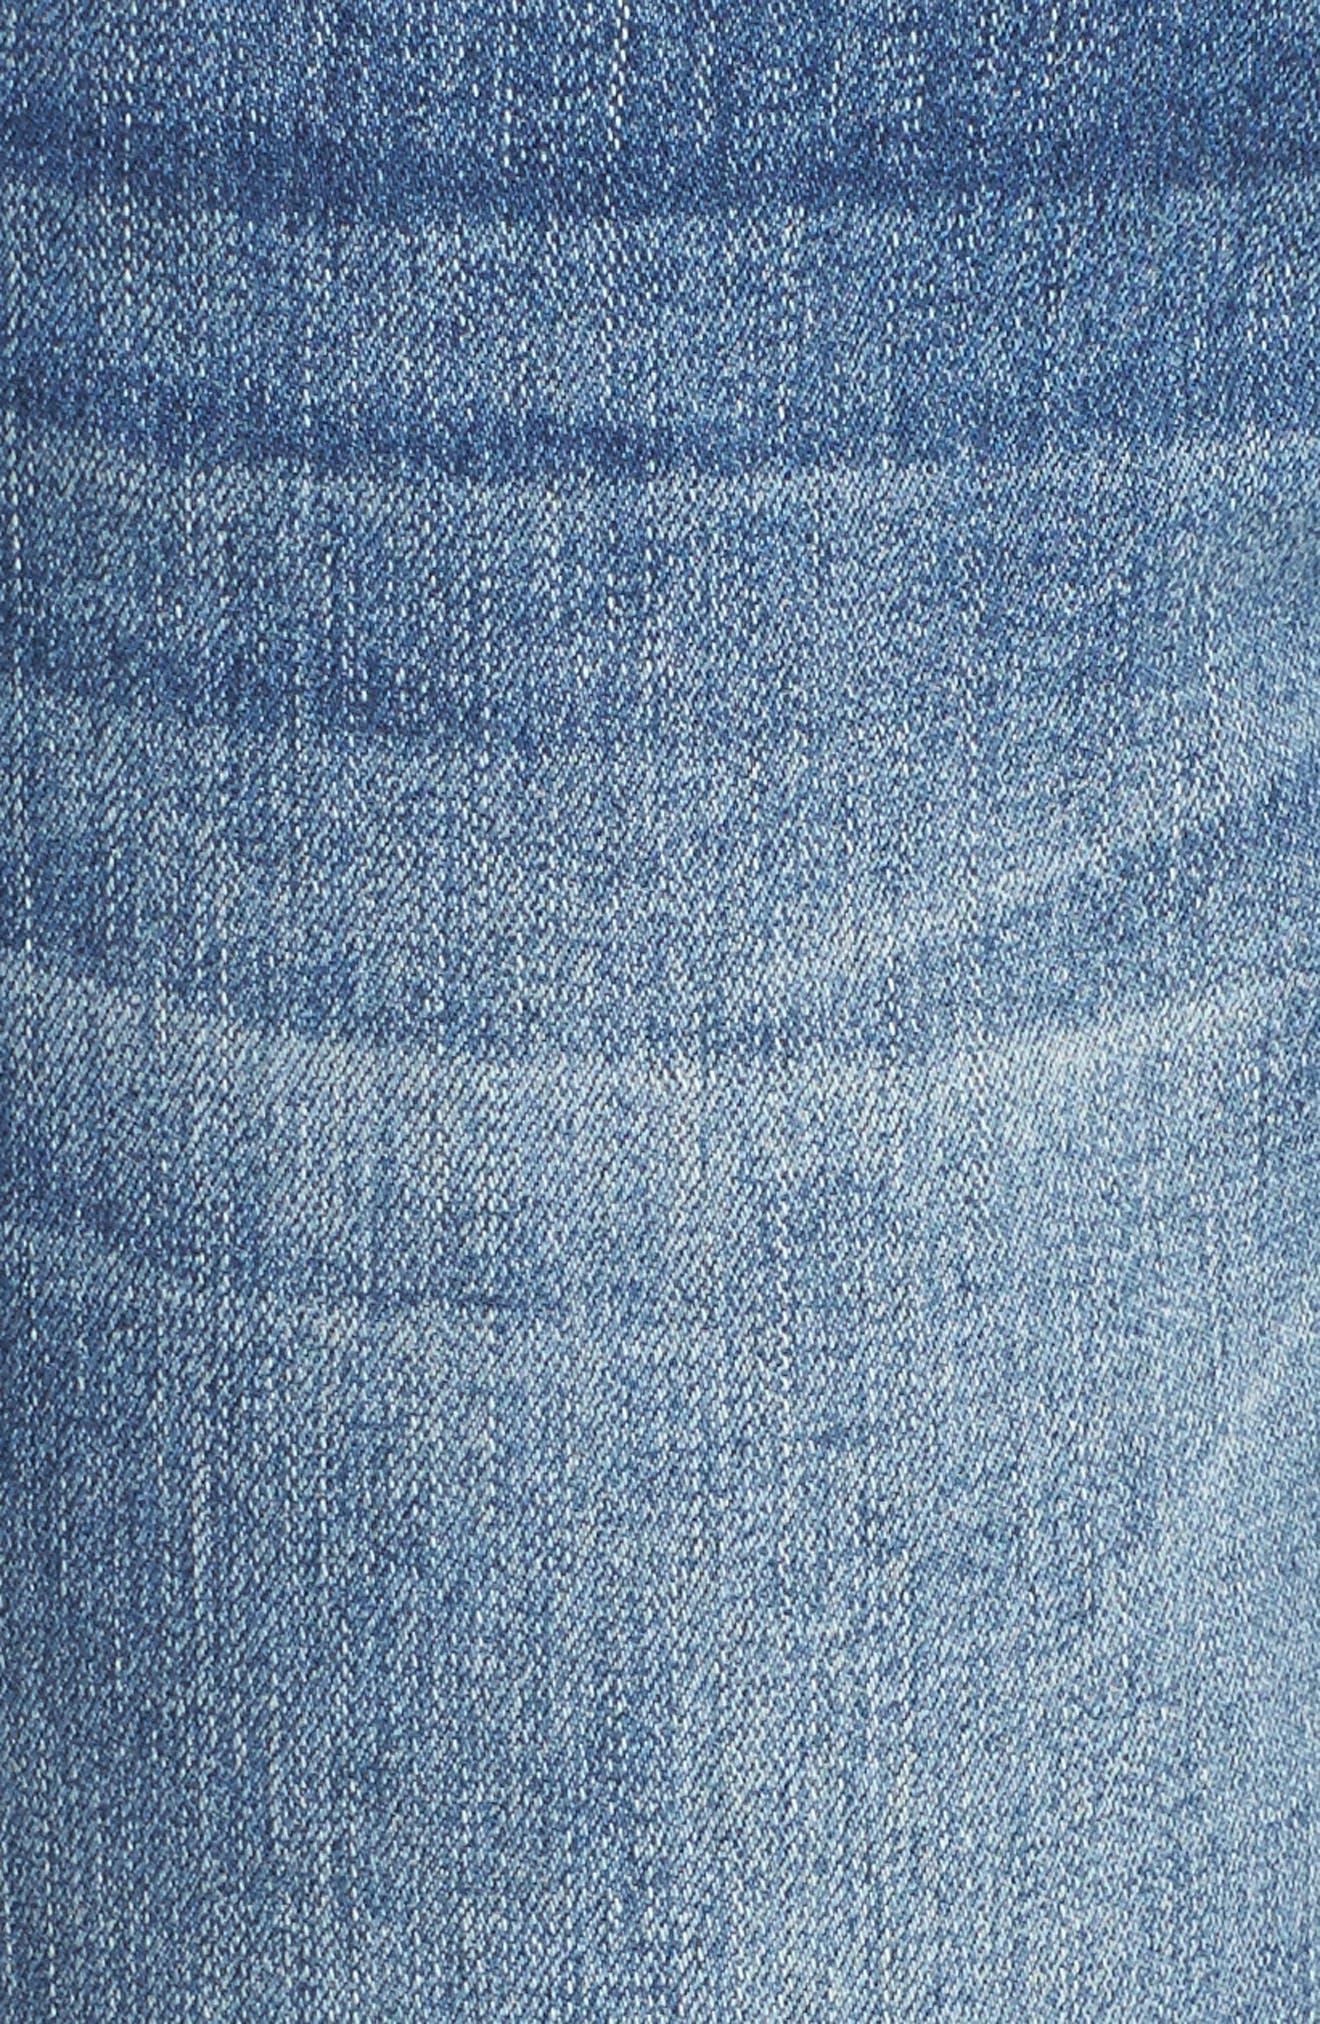 Long Straight Ankle Jeans,                             Alternate thumbnail 5, color,                             Horizon Blue